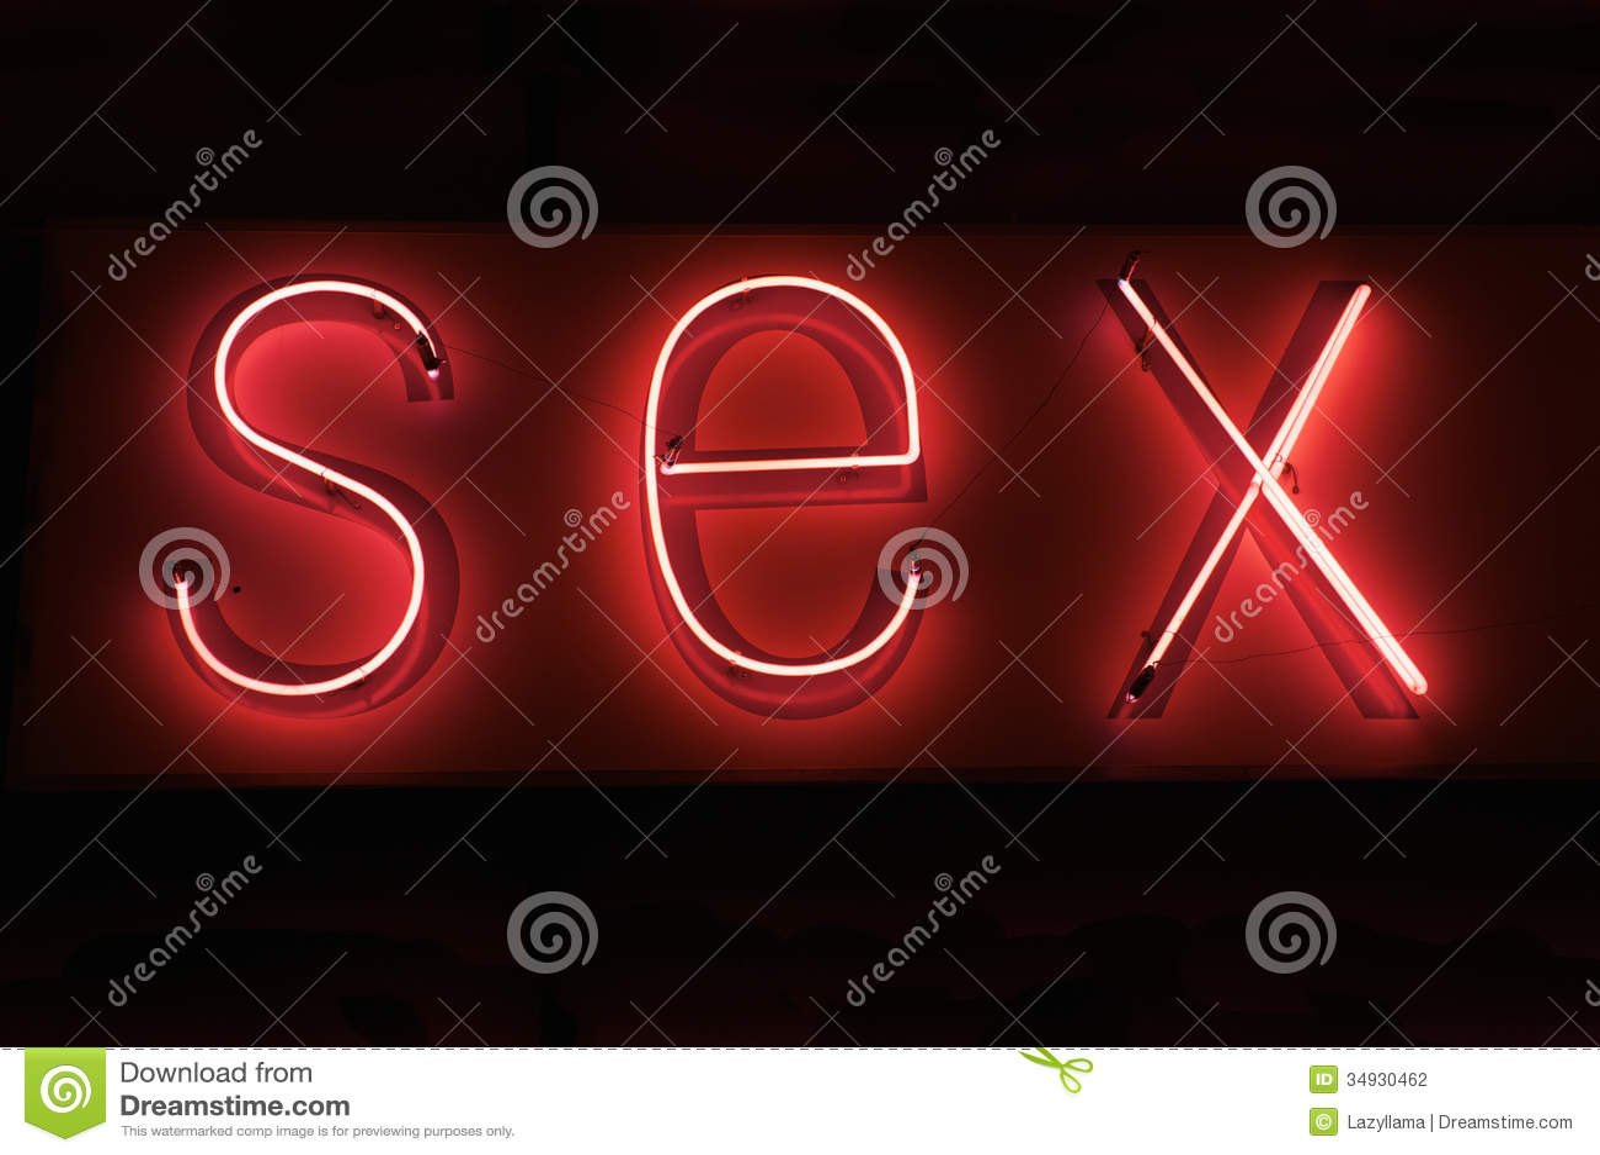 chaud sexe vidéo Télécharger en HD Nikki Sex massage